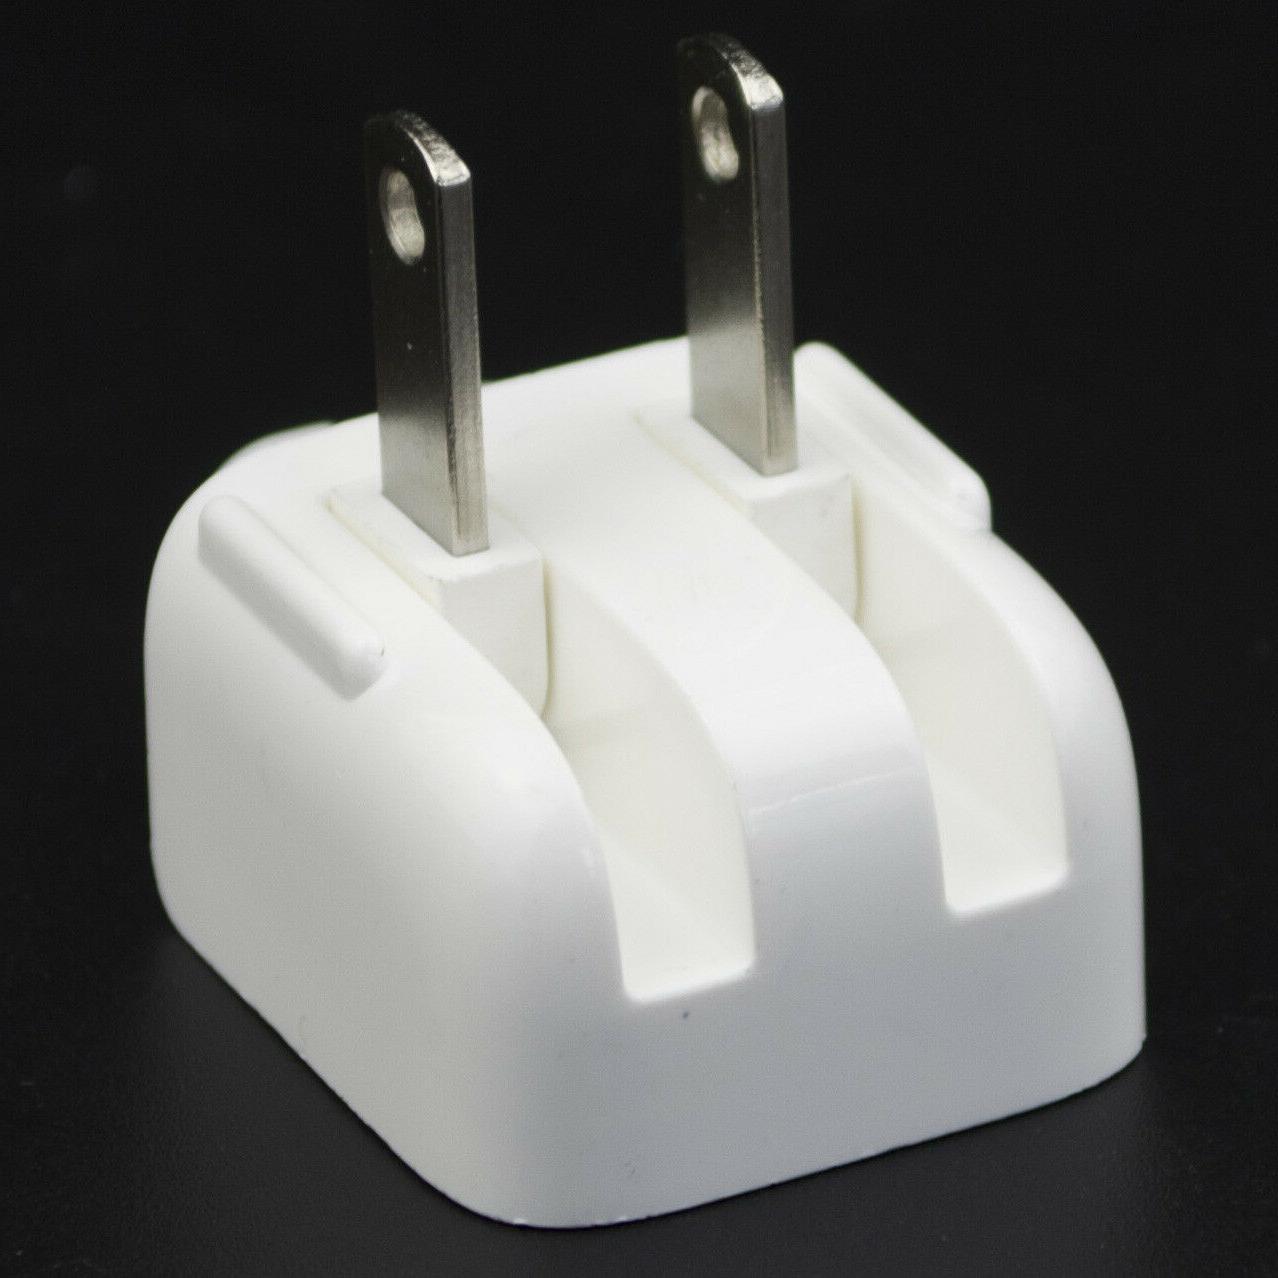 2 Safe DUCKHEAD PRONG PLUG 45W Apple